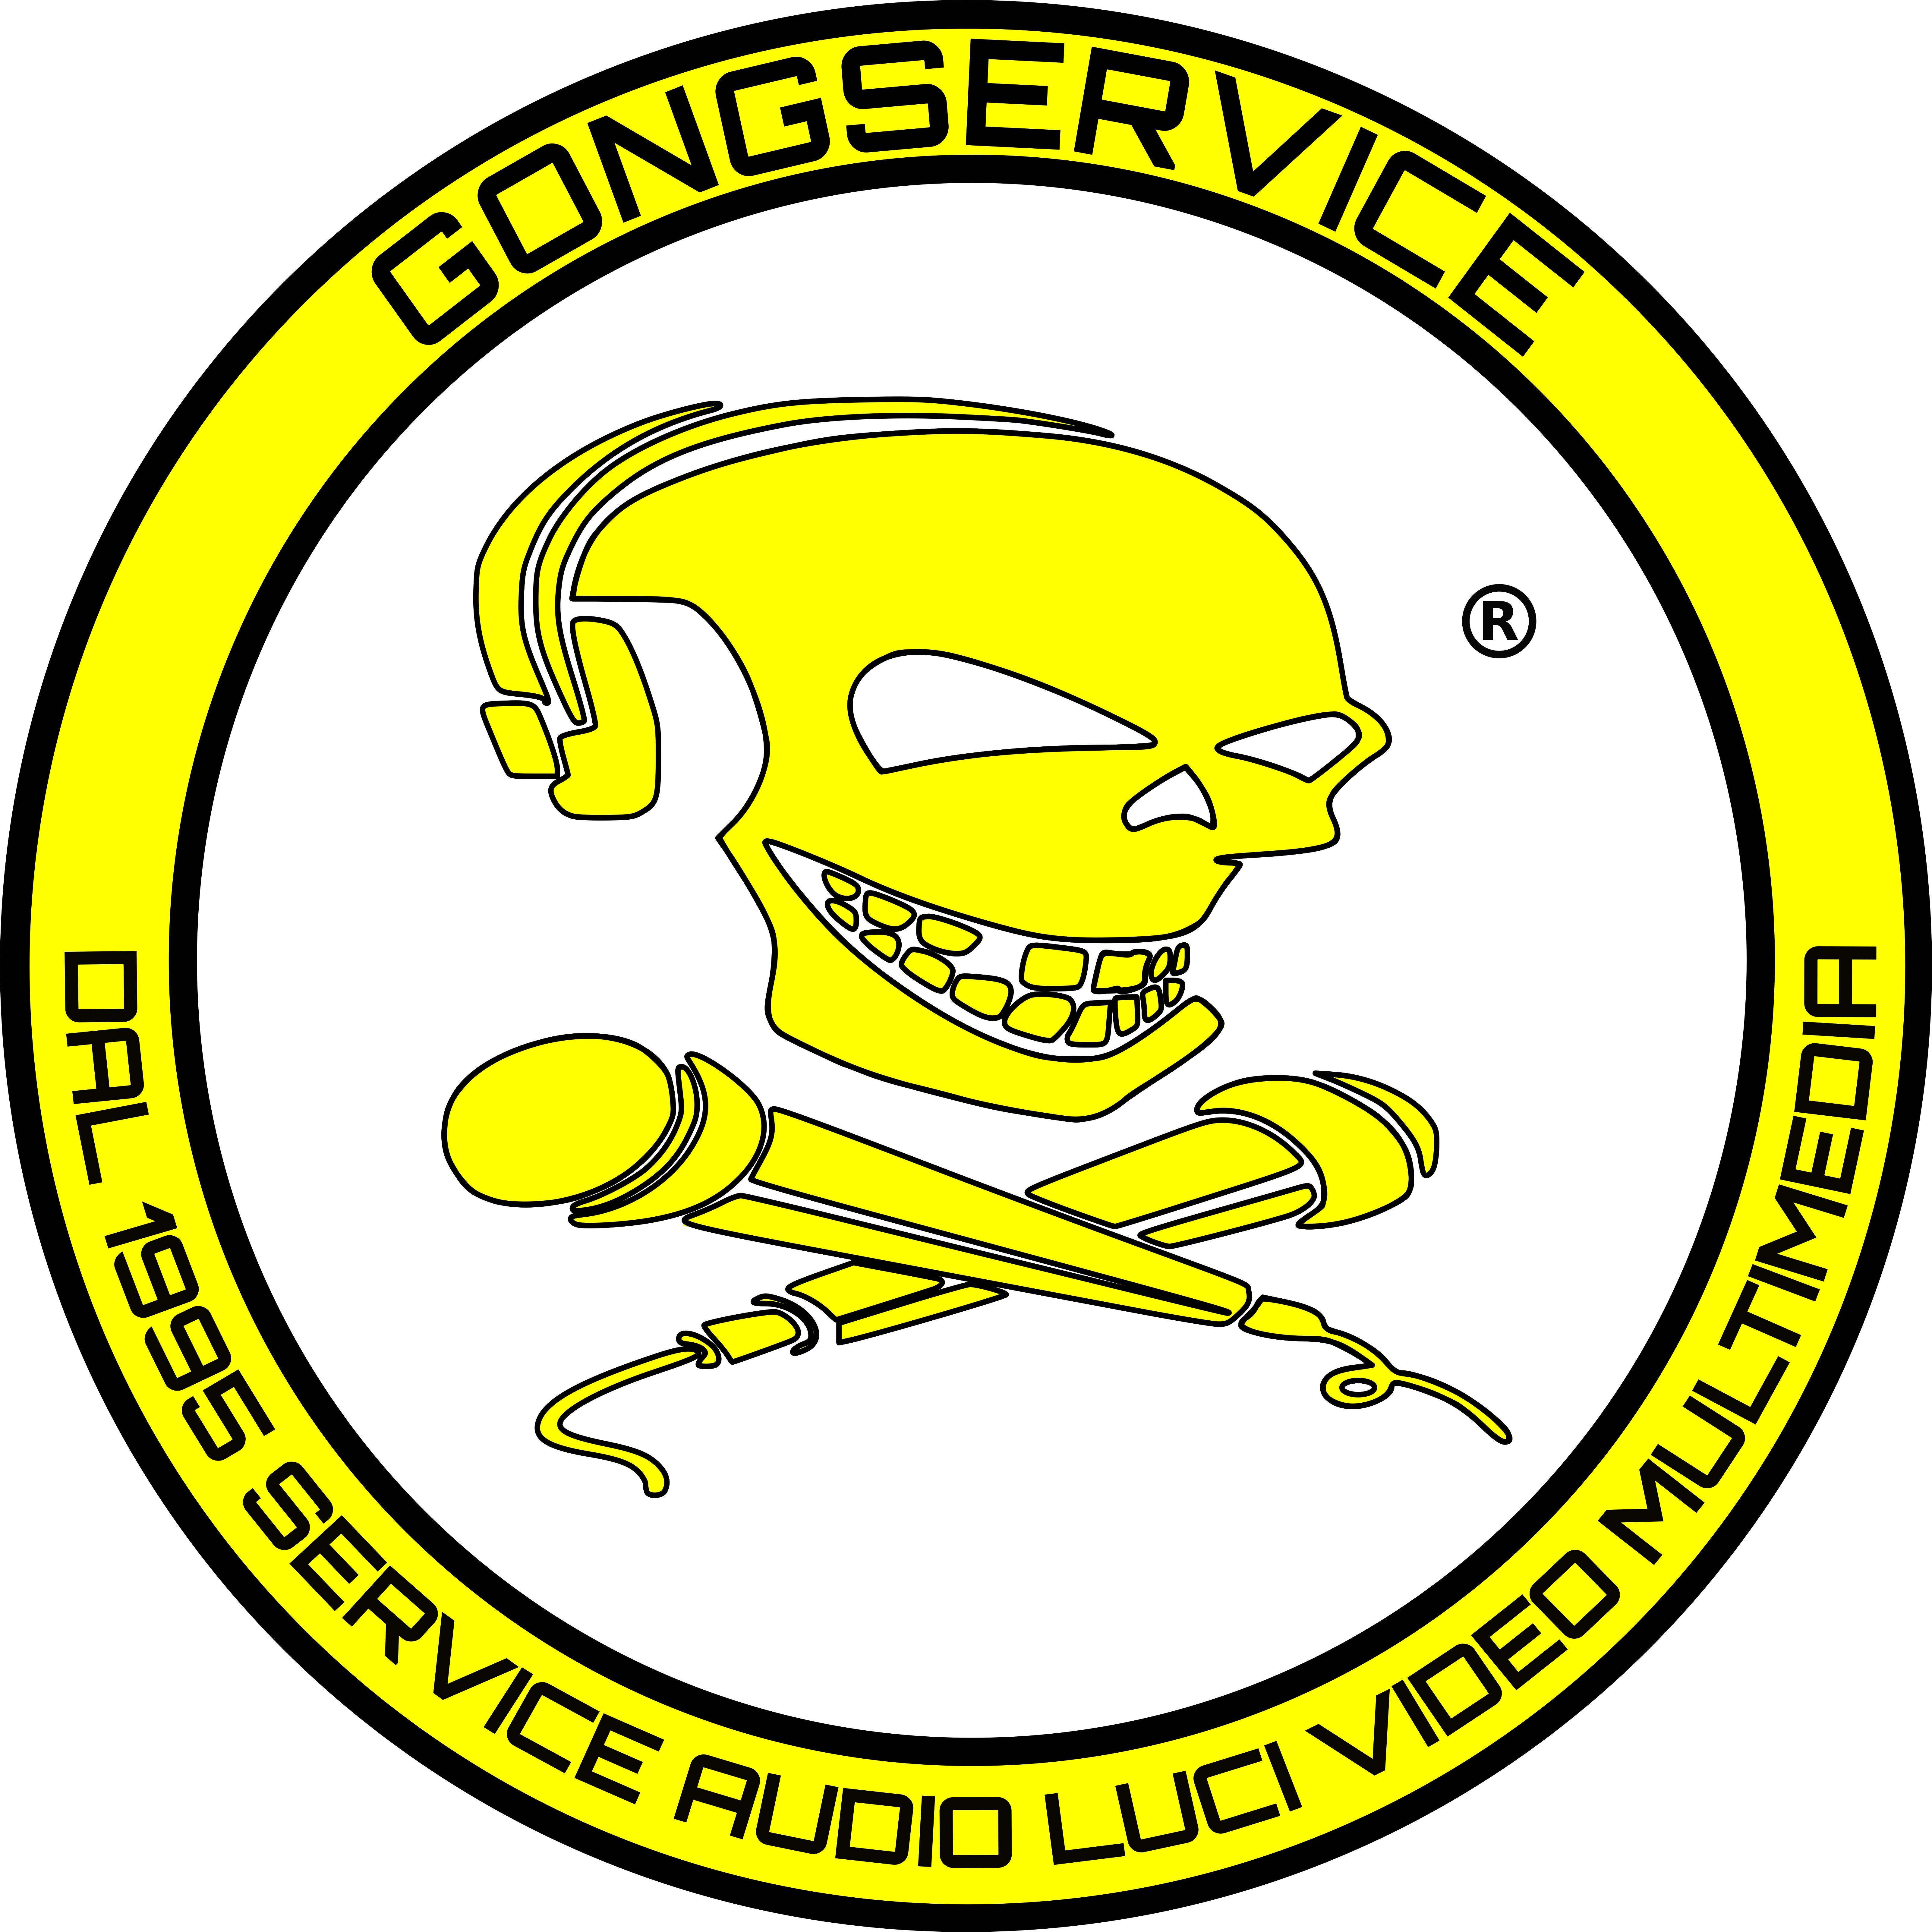 GongService